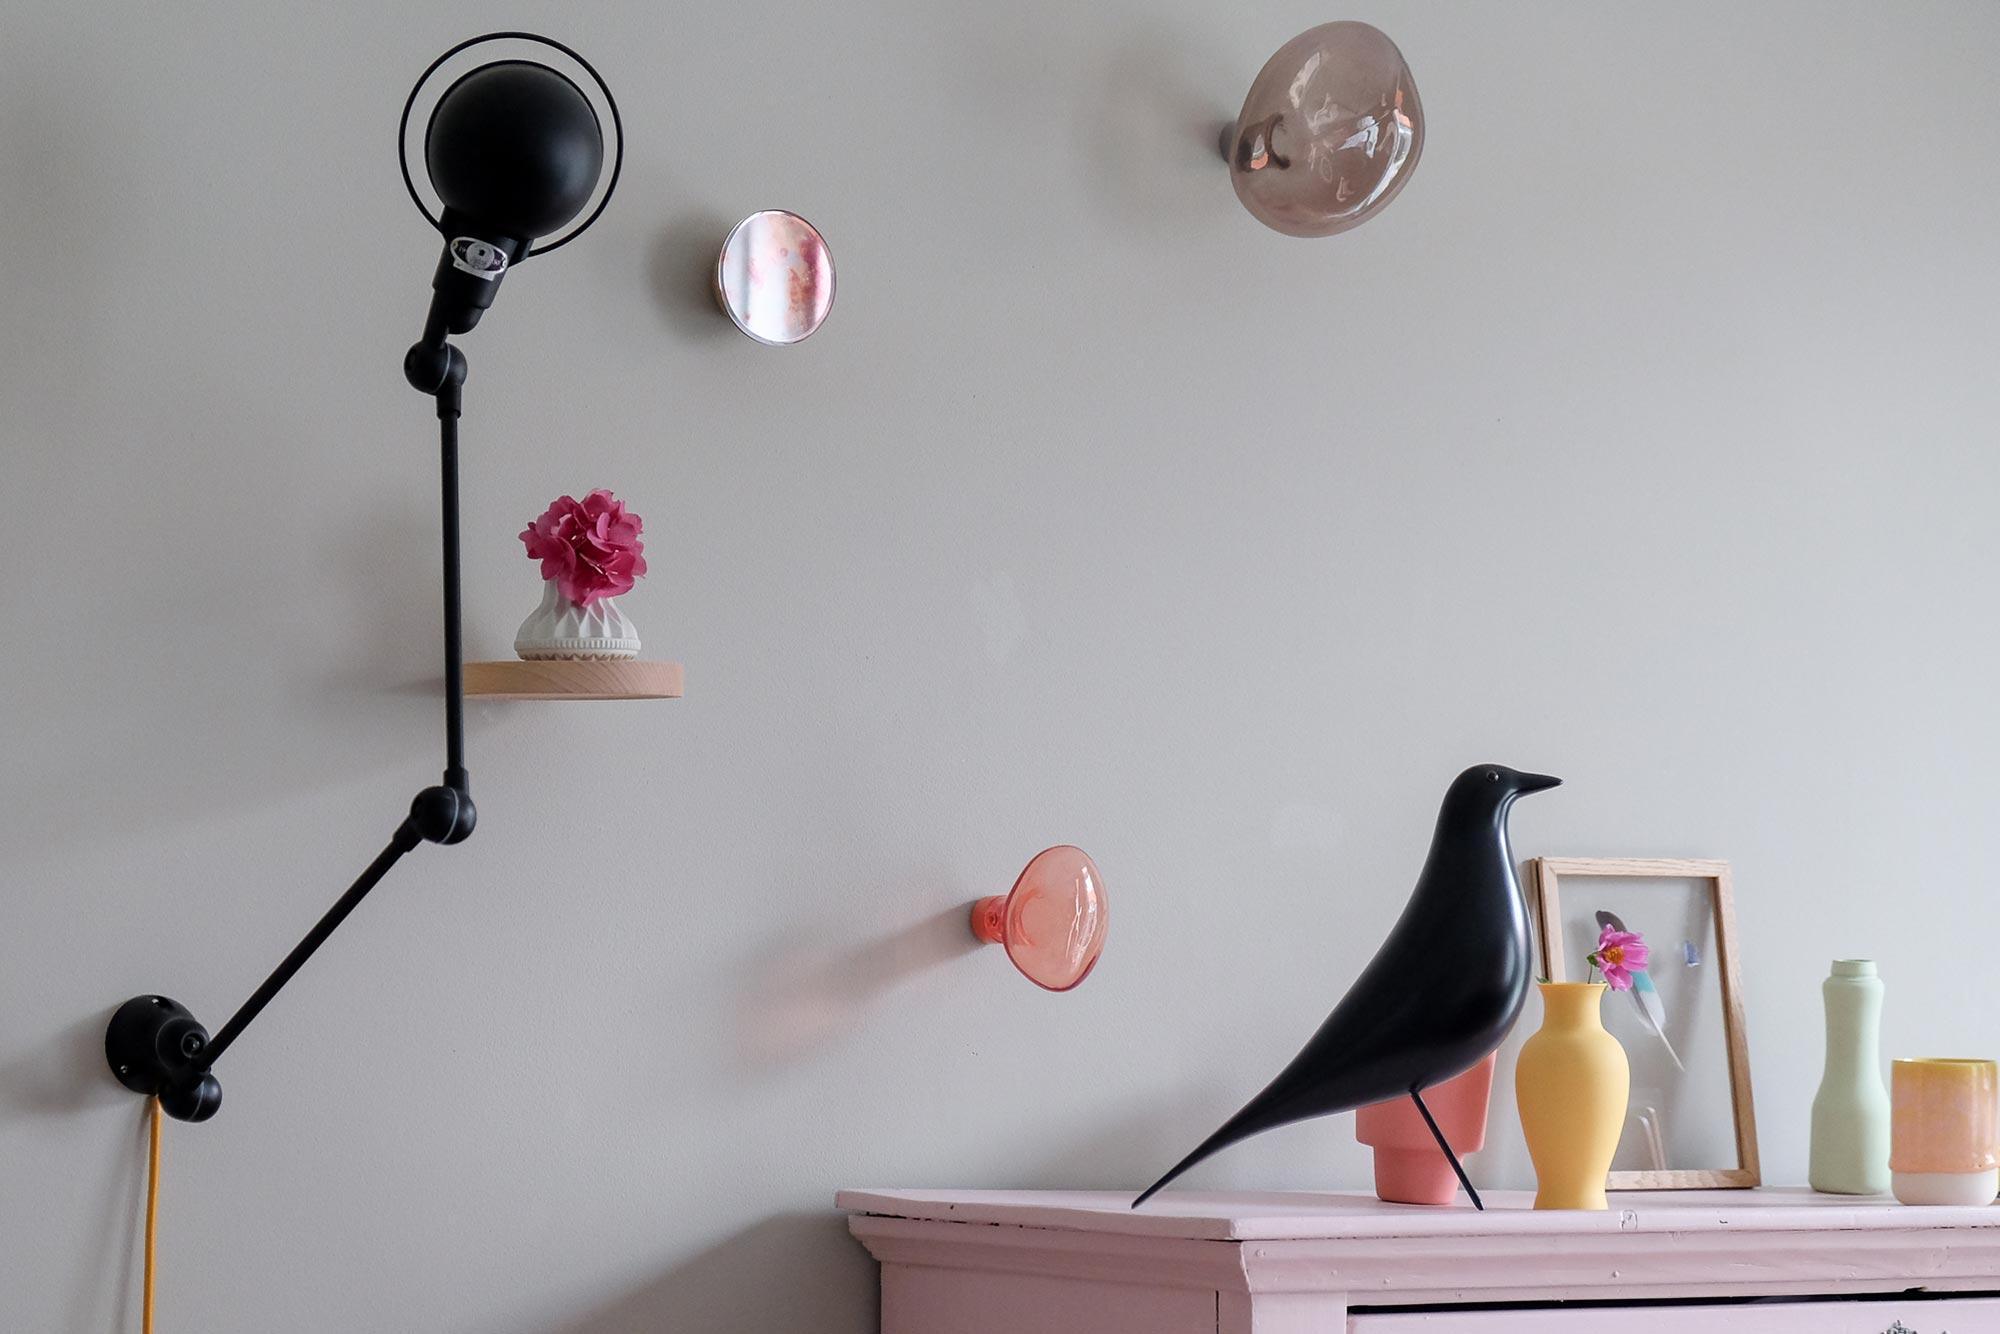 Designvogel House Bird Vitra Eames met PRCHTG